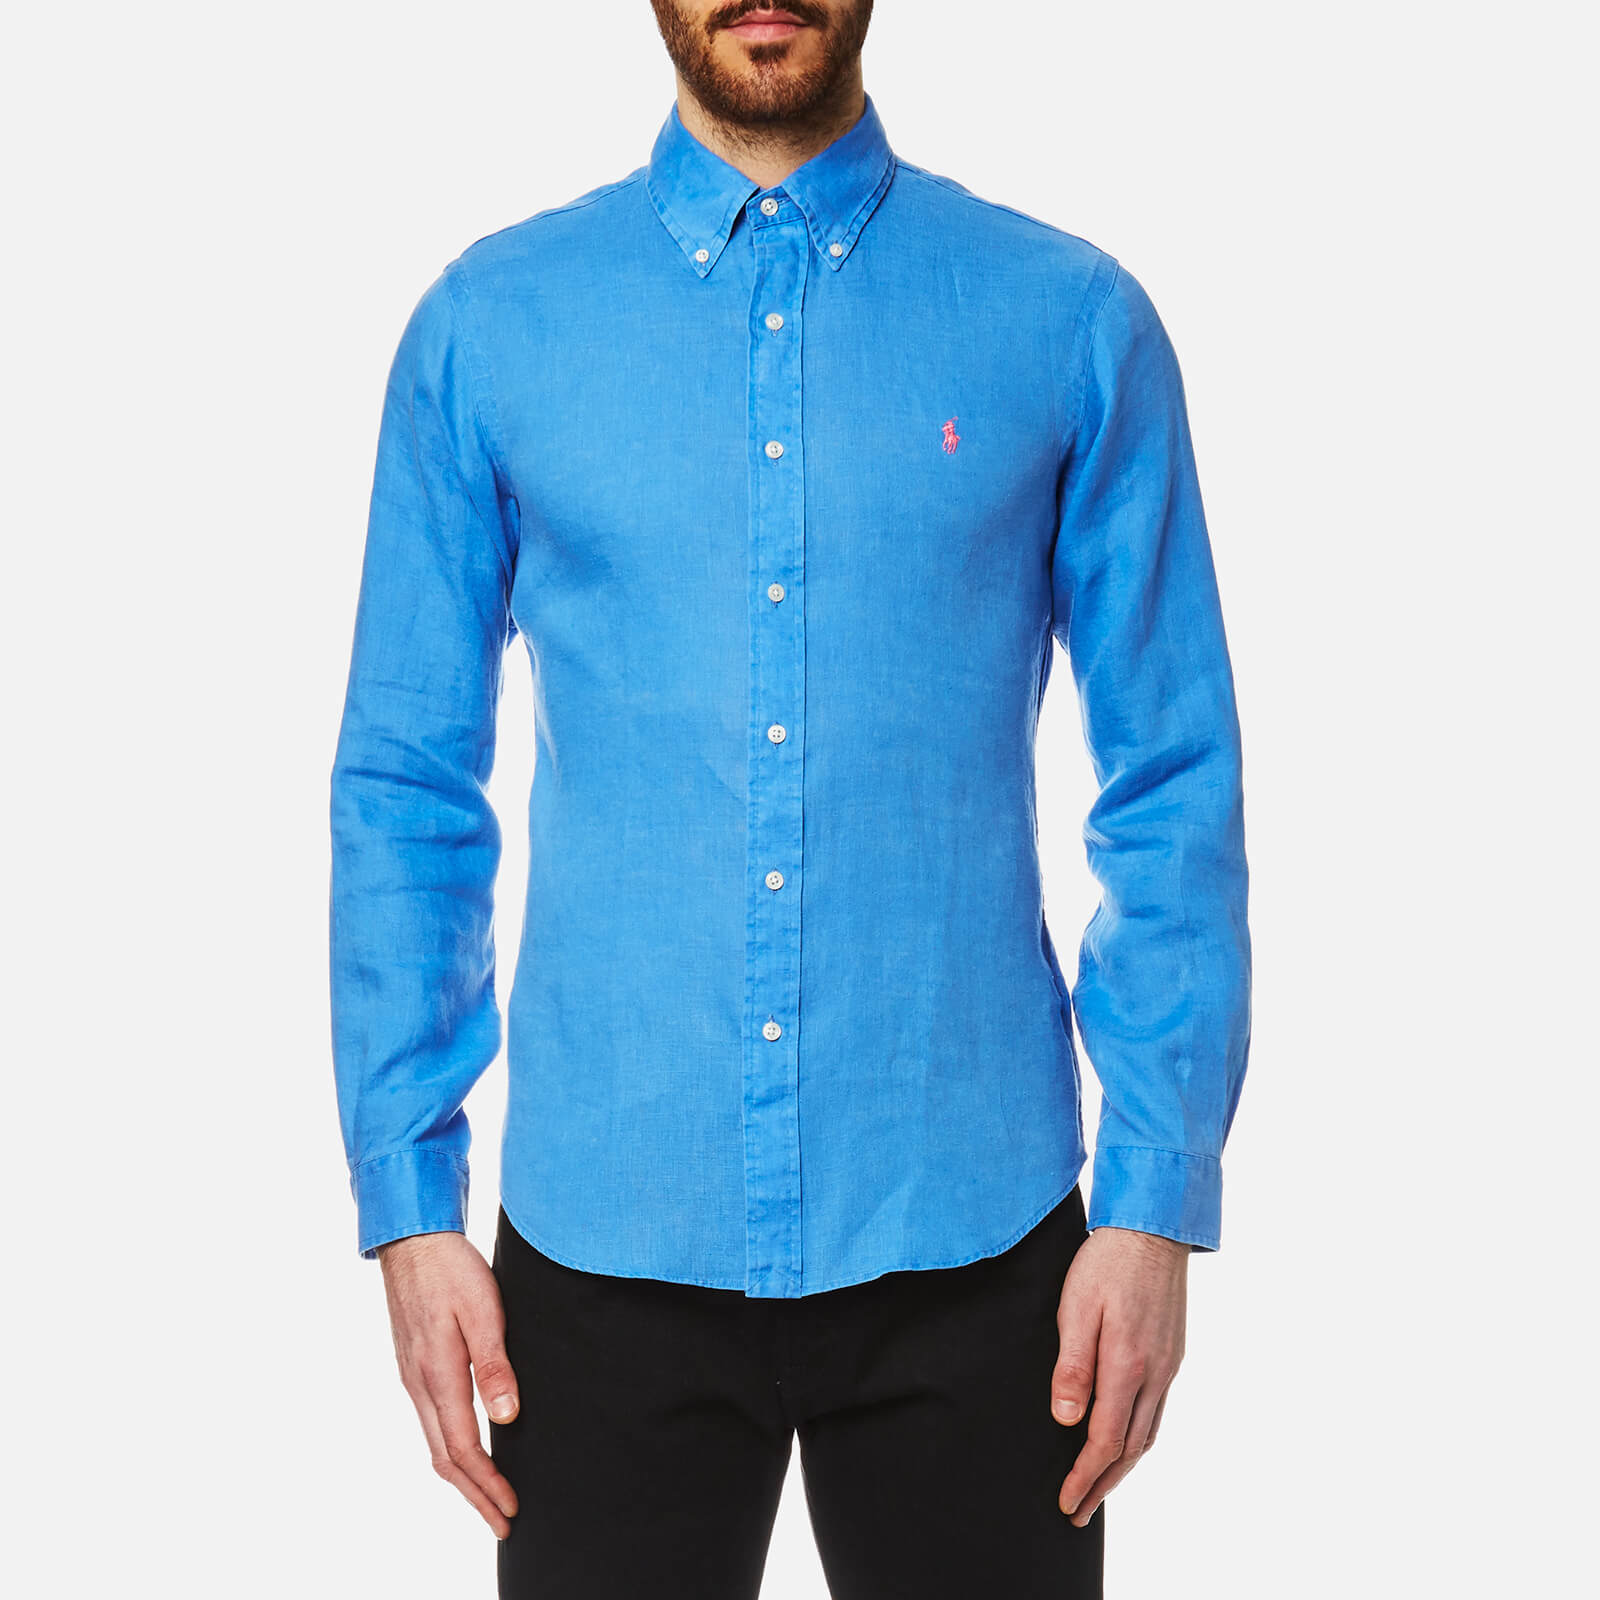 0e828179 Polo Ralph Lauren Men's Linen Long Sleeve Slim Fit Shirt - Blue - Free UK  Delivery over £50